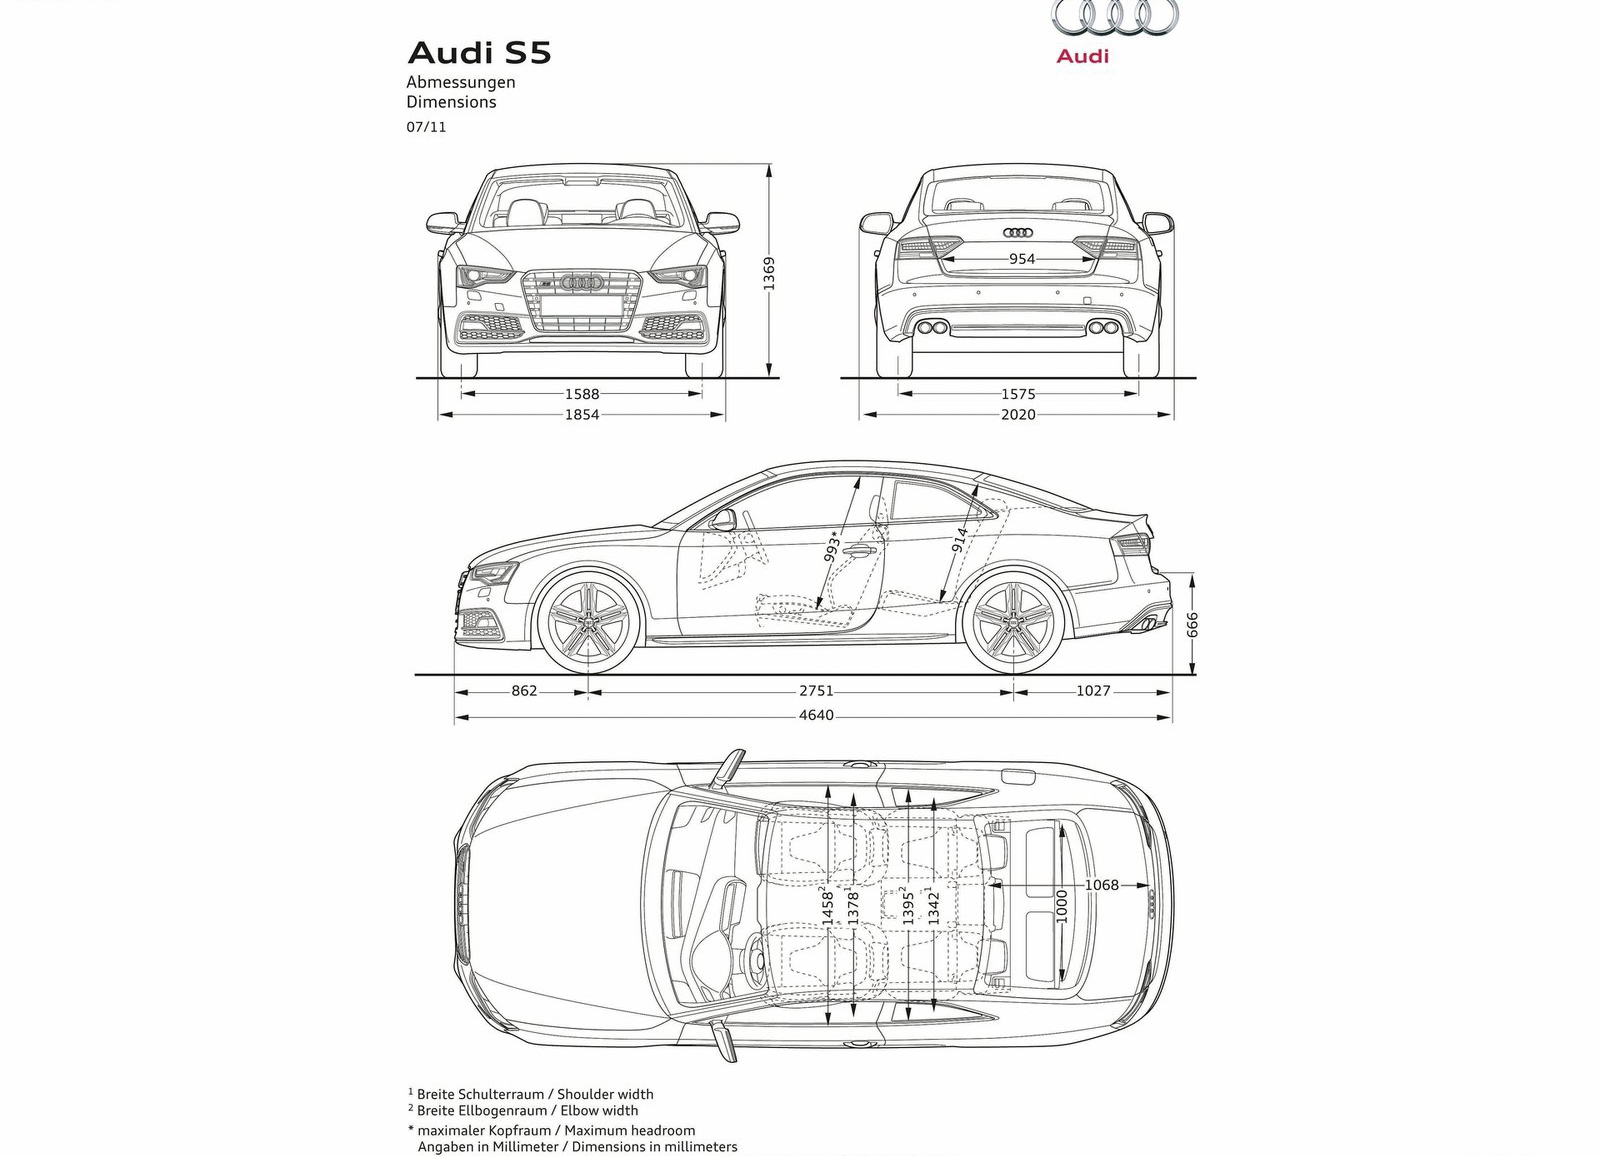 Audi S5 Wallpapers